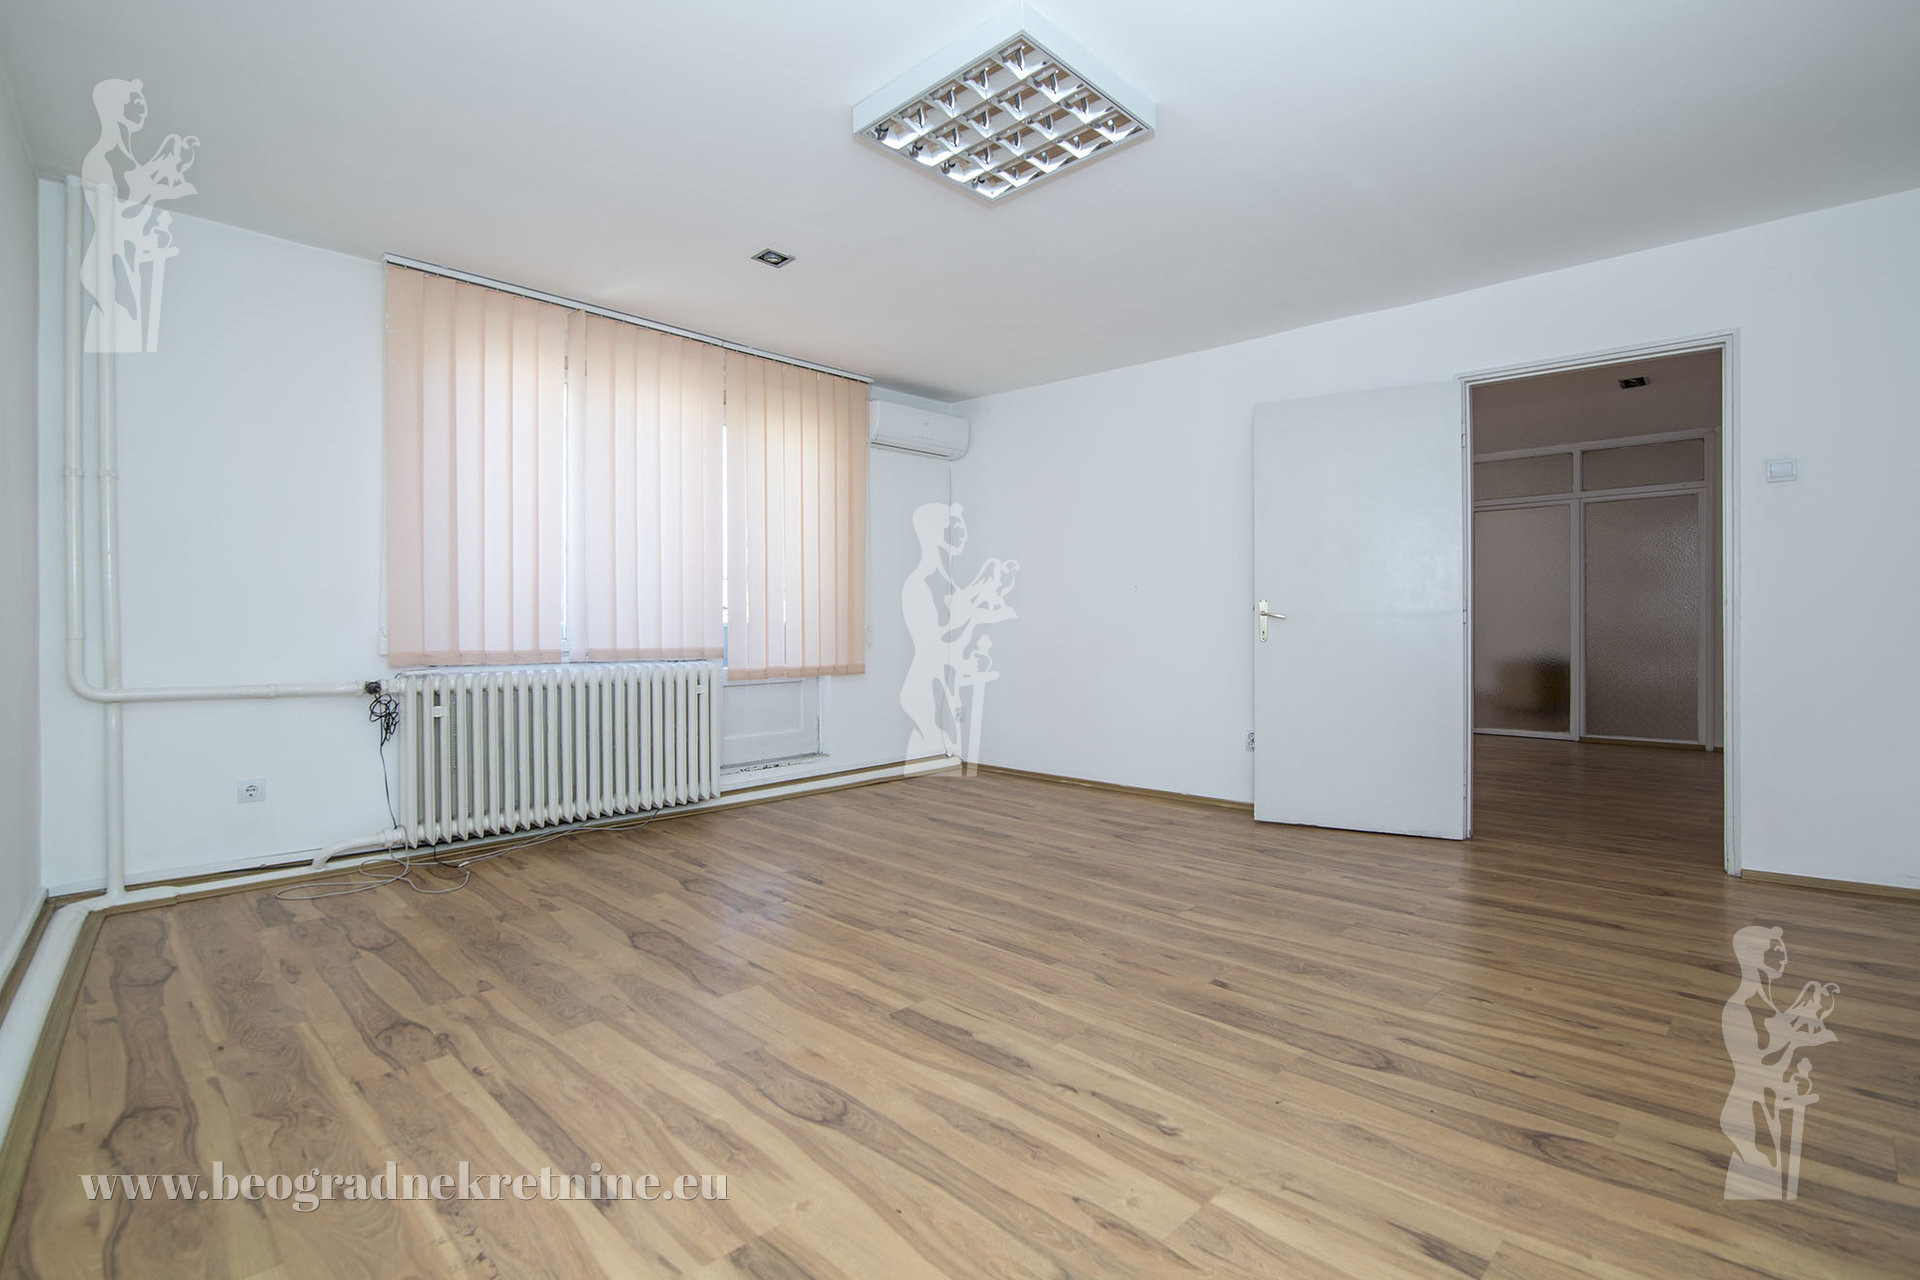 Poslovni prostor , Stari Grad , Beograd (grad) , Izdavanje | Poslovni Prostor Skupština Kosovska